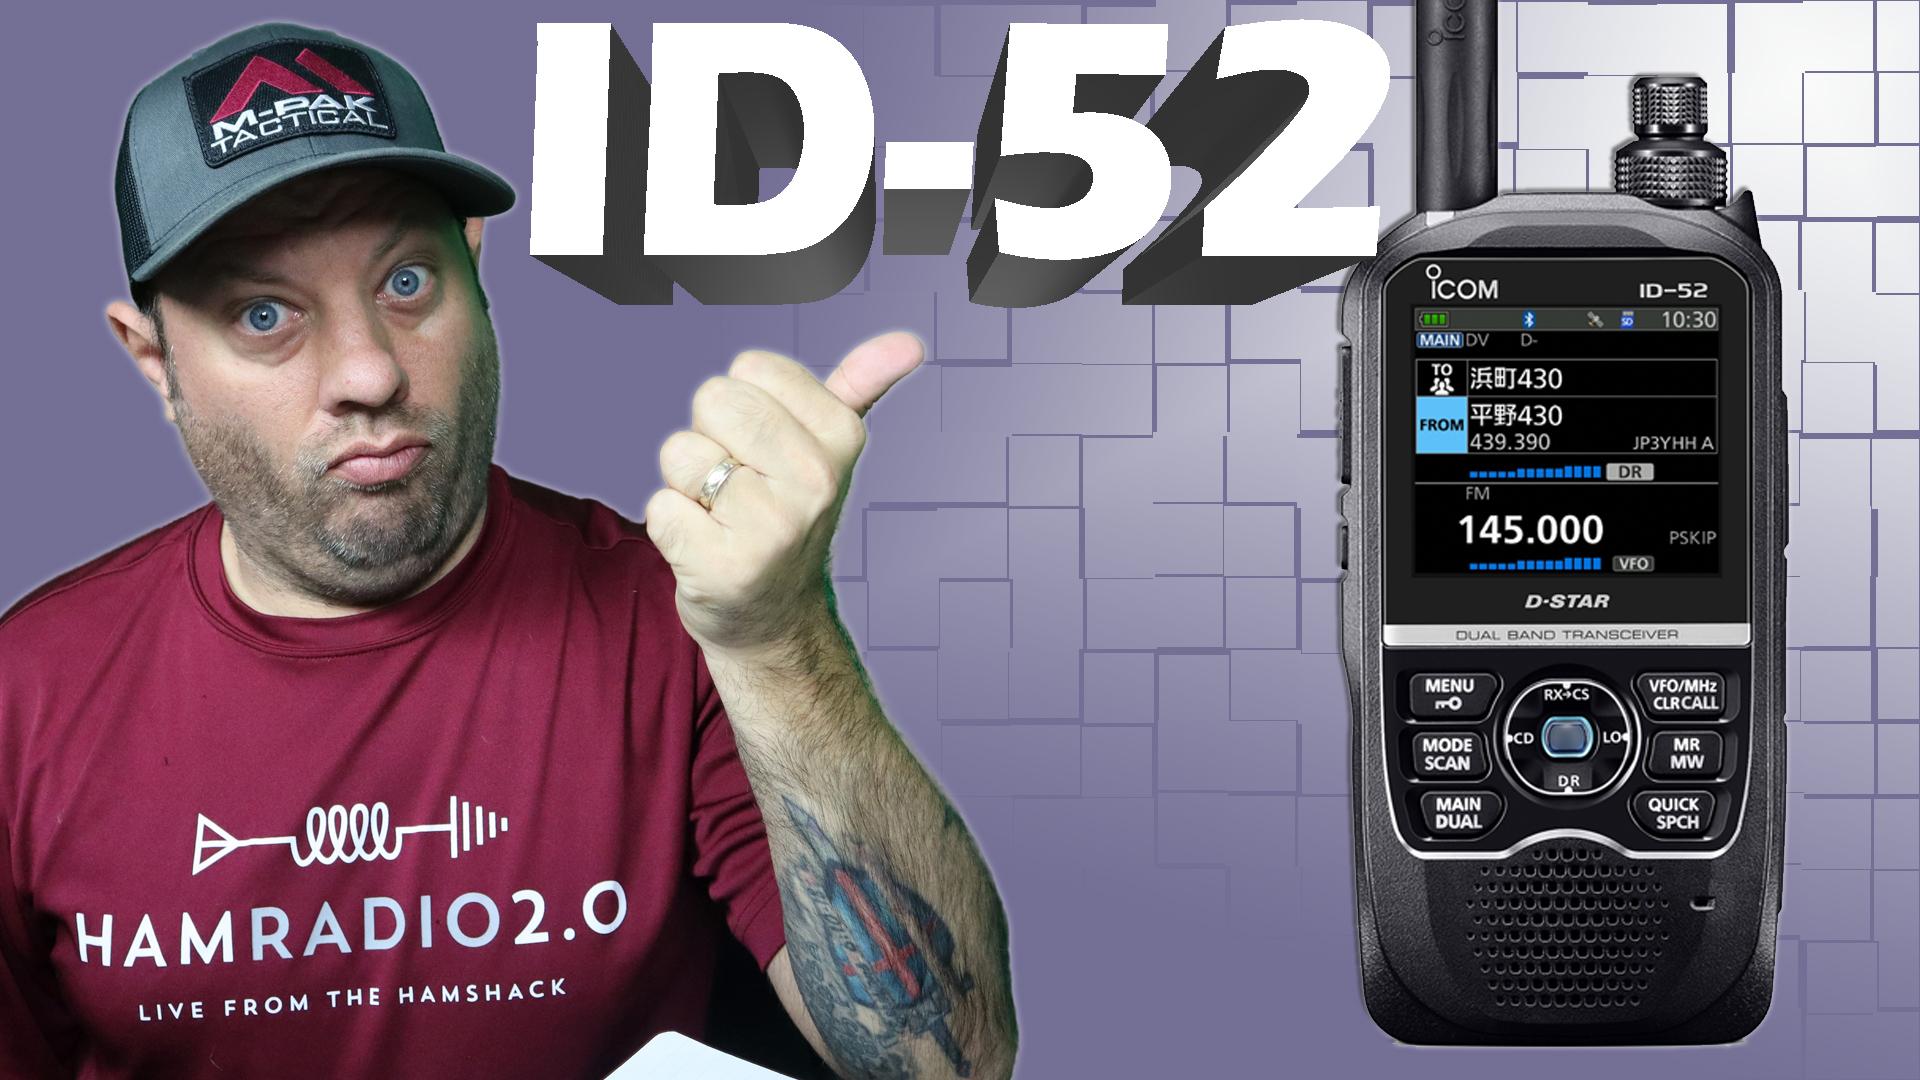 Episode 431: Icom Reveals the ID-52A/E Dual Band DSTAR Radio | New DSTAR Radio Announced!